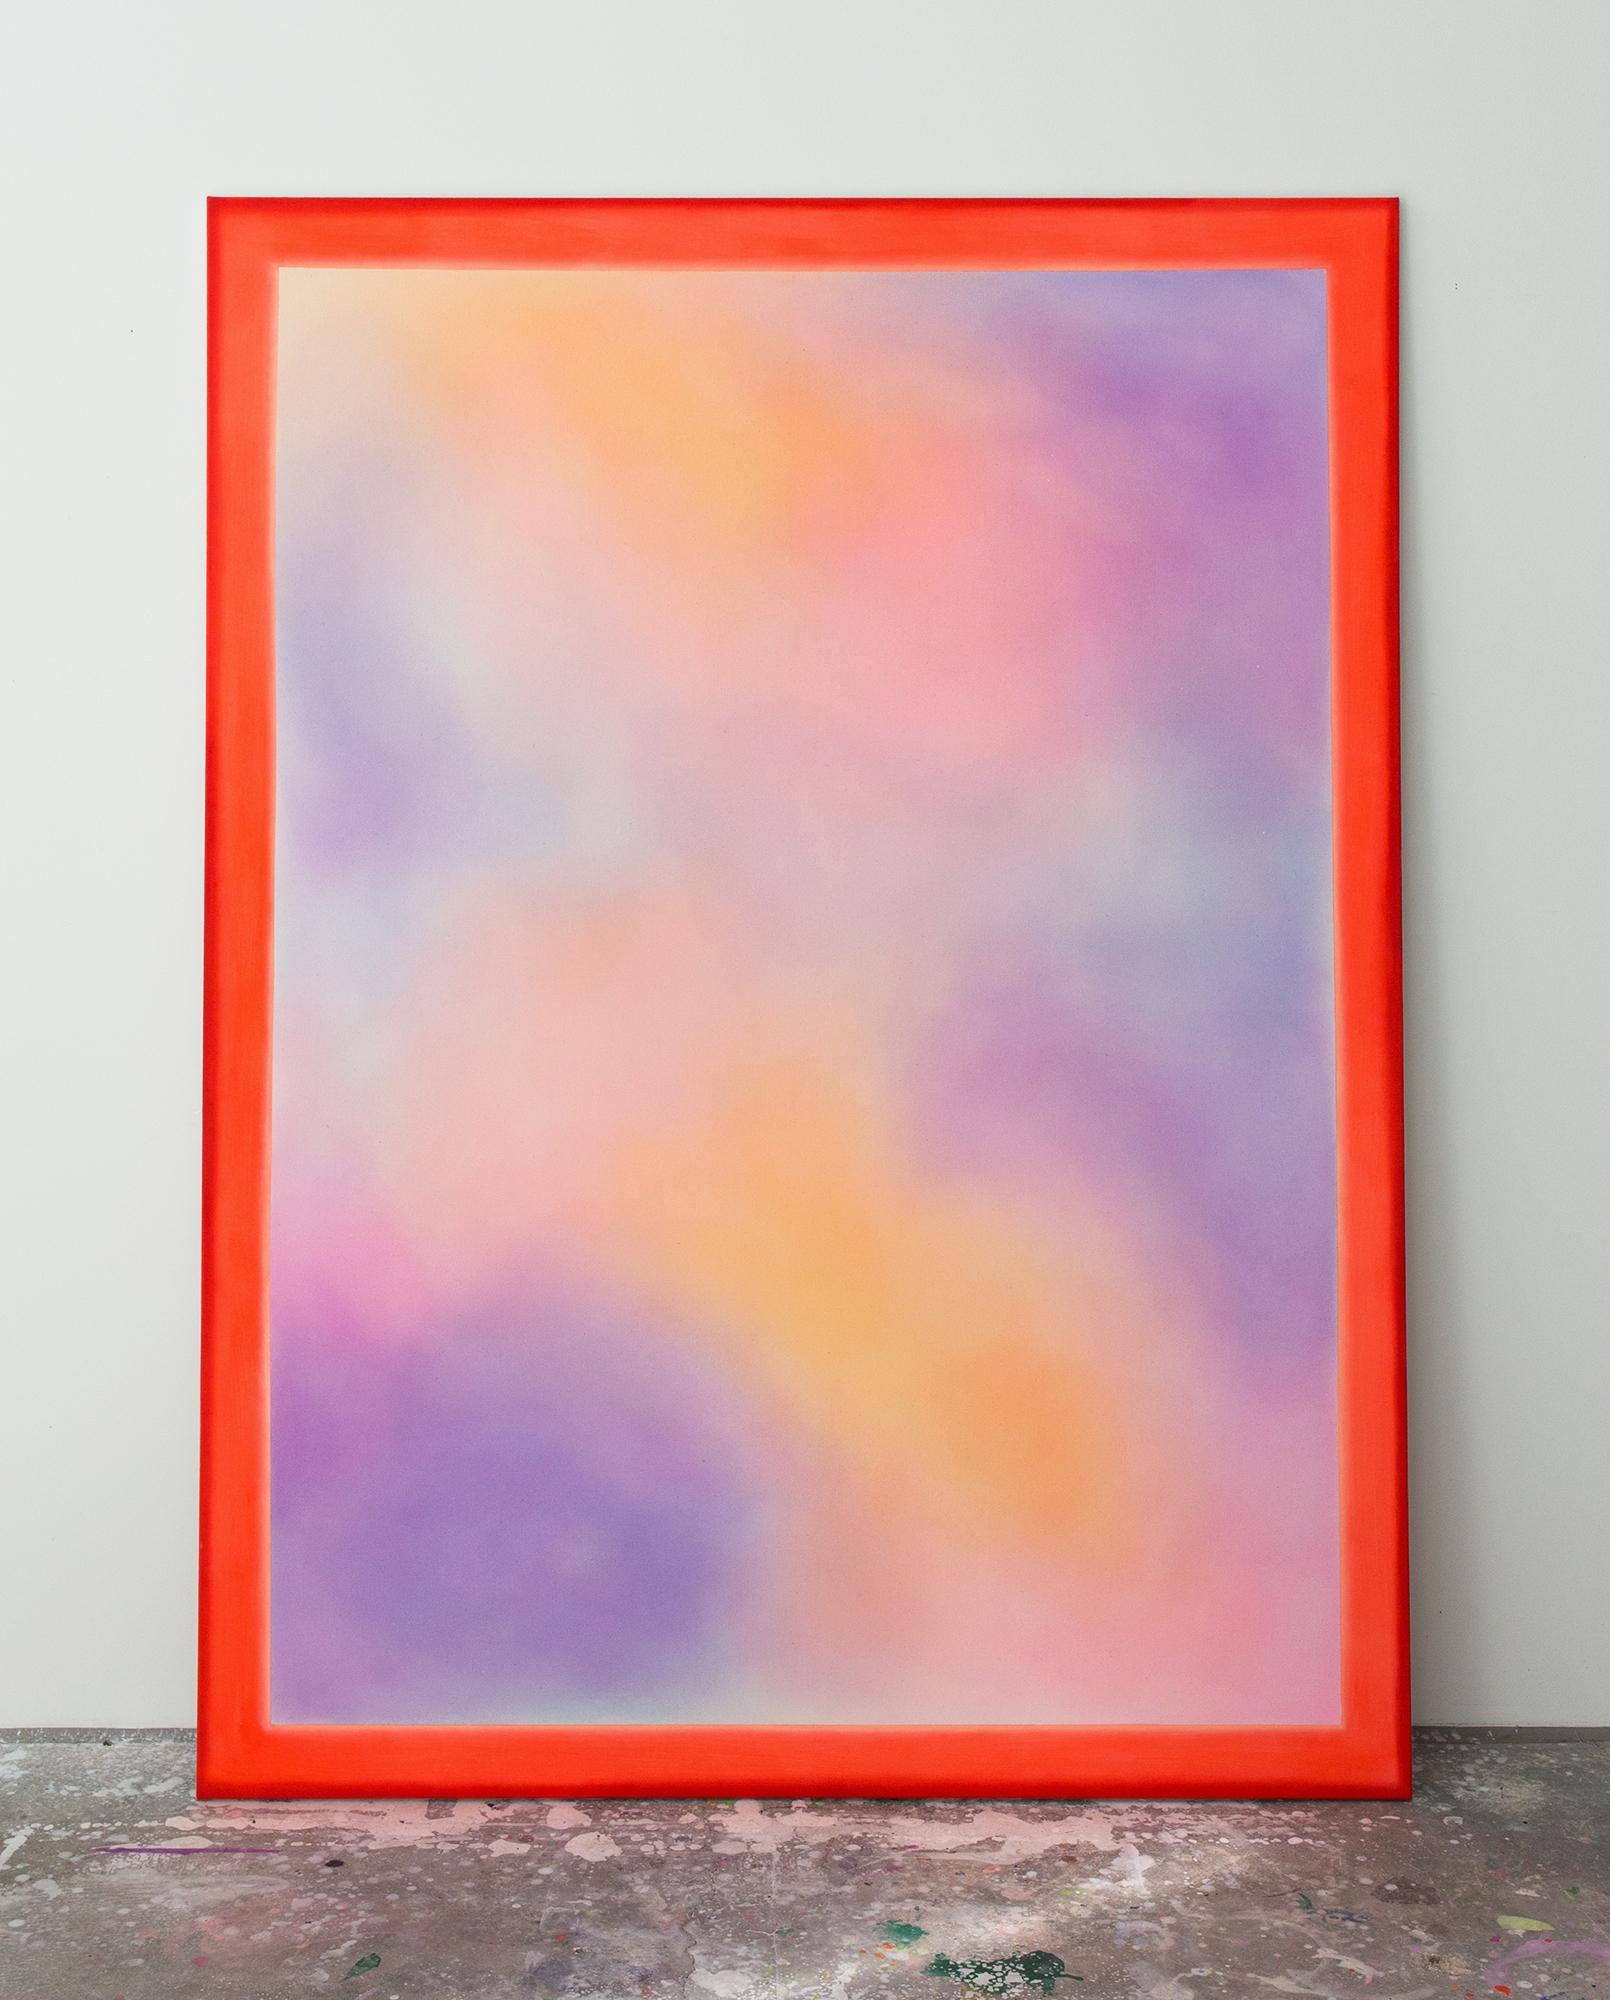 "Alina Birkner ""Untitled (Red Frame) 2016, 200x150 cm, Acrylic on Canvas"